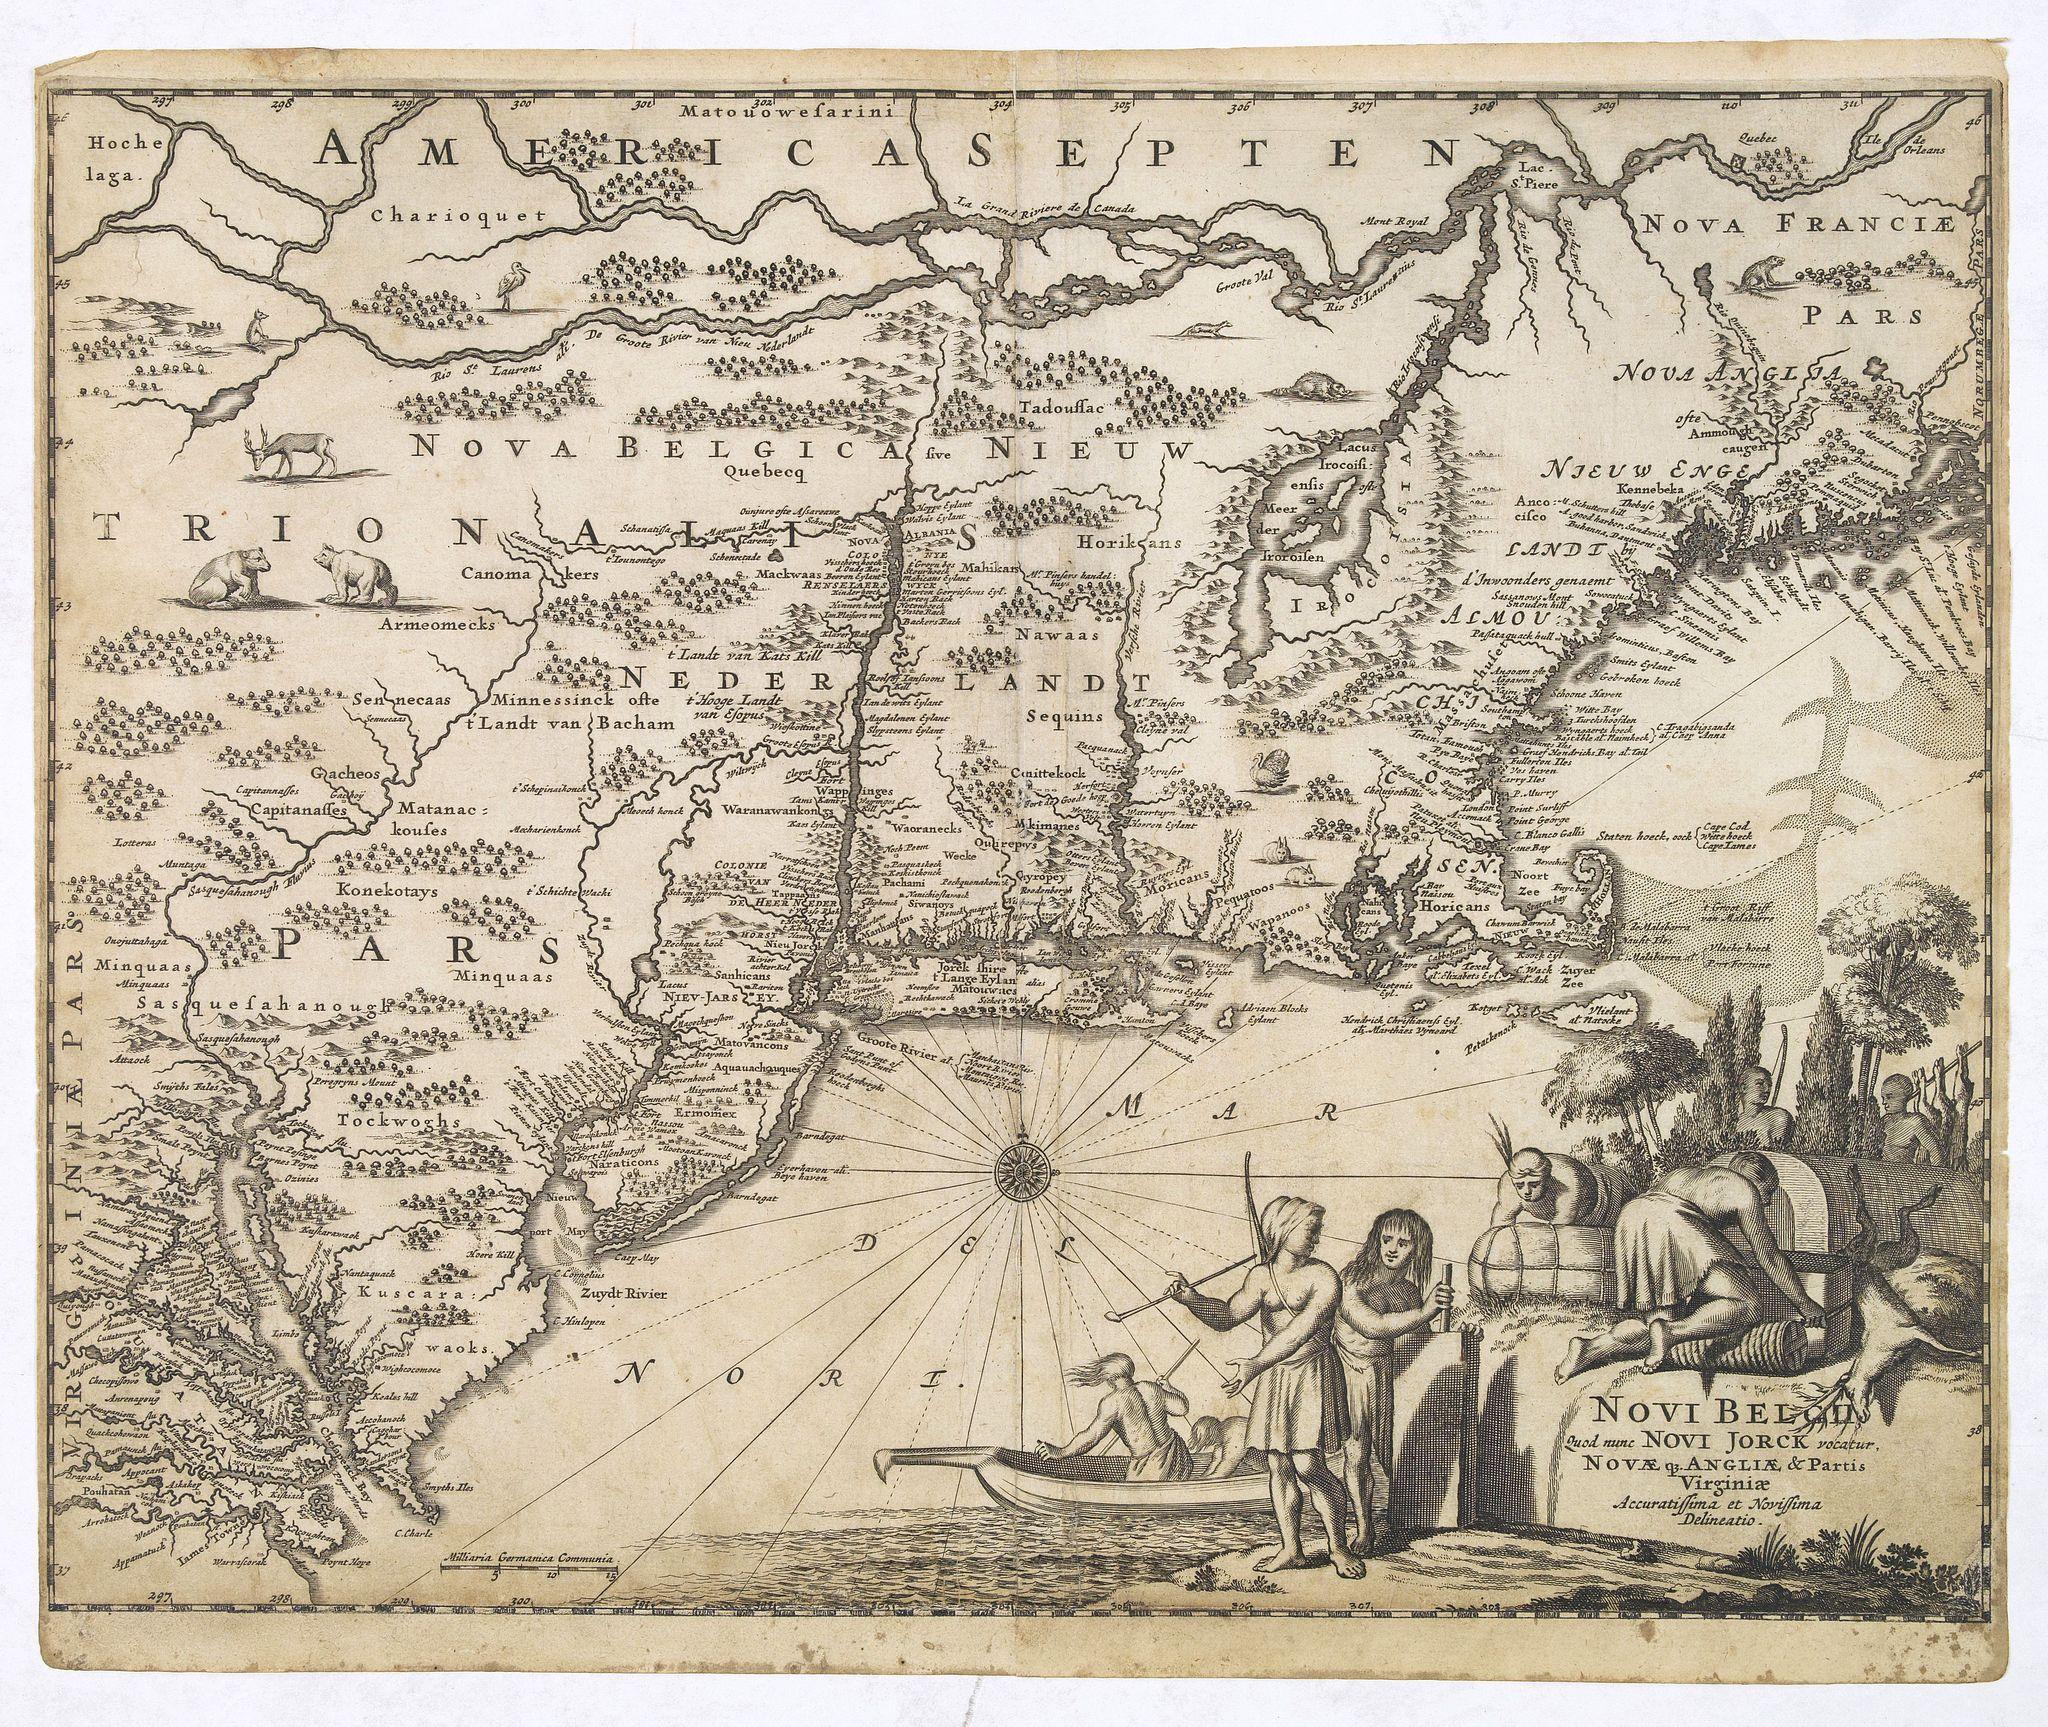 MONTANUS, A. -  Novi Belgii, quod nunc Novi Jorck vocatur, Novaeque Anglia et partis Virginiae. . .